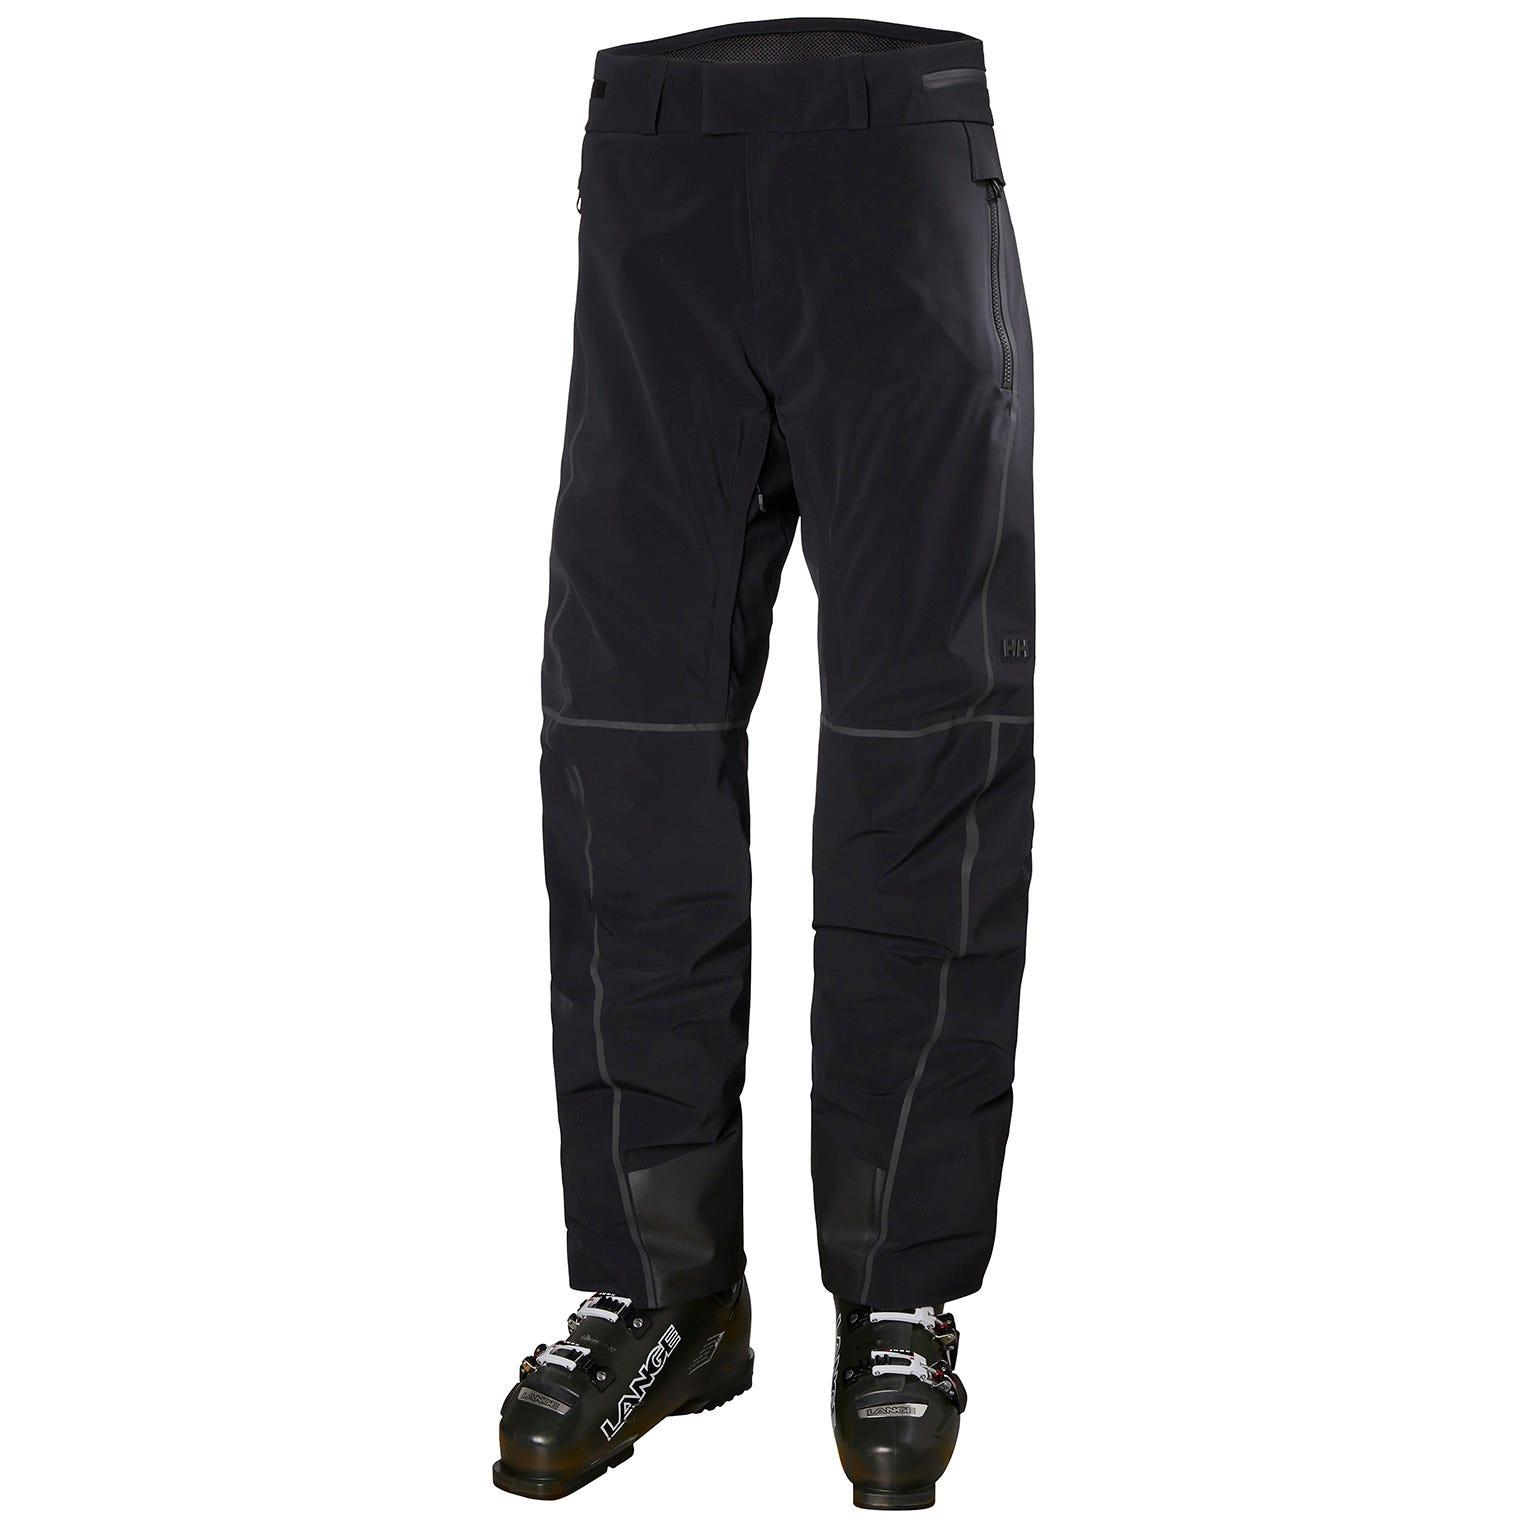 Helly Hansen Mens Icon 4.0 Sonic Welded Ski Trousers Black XL